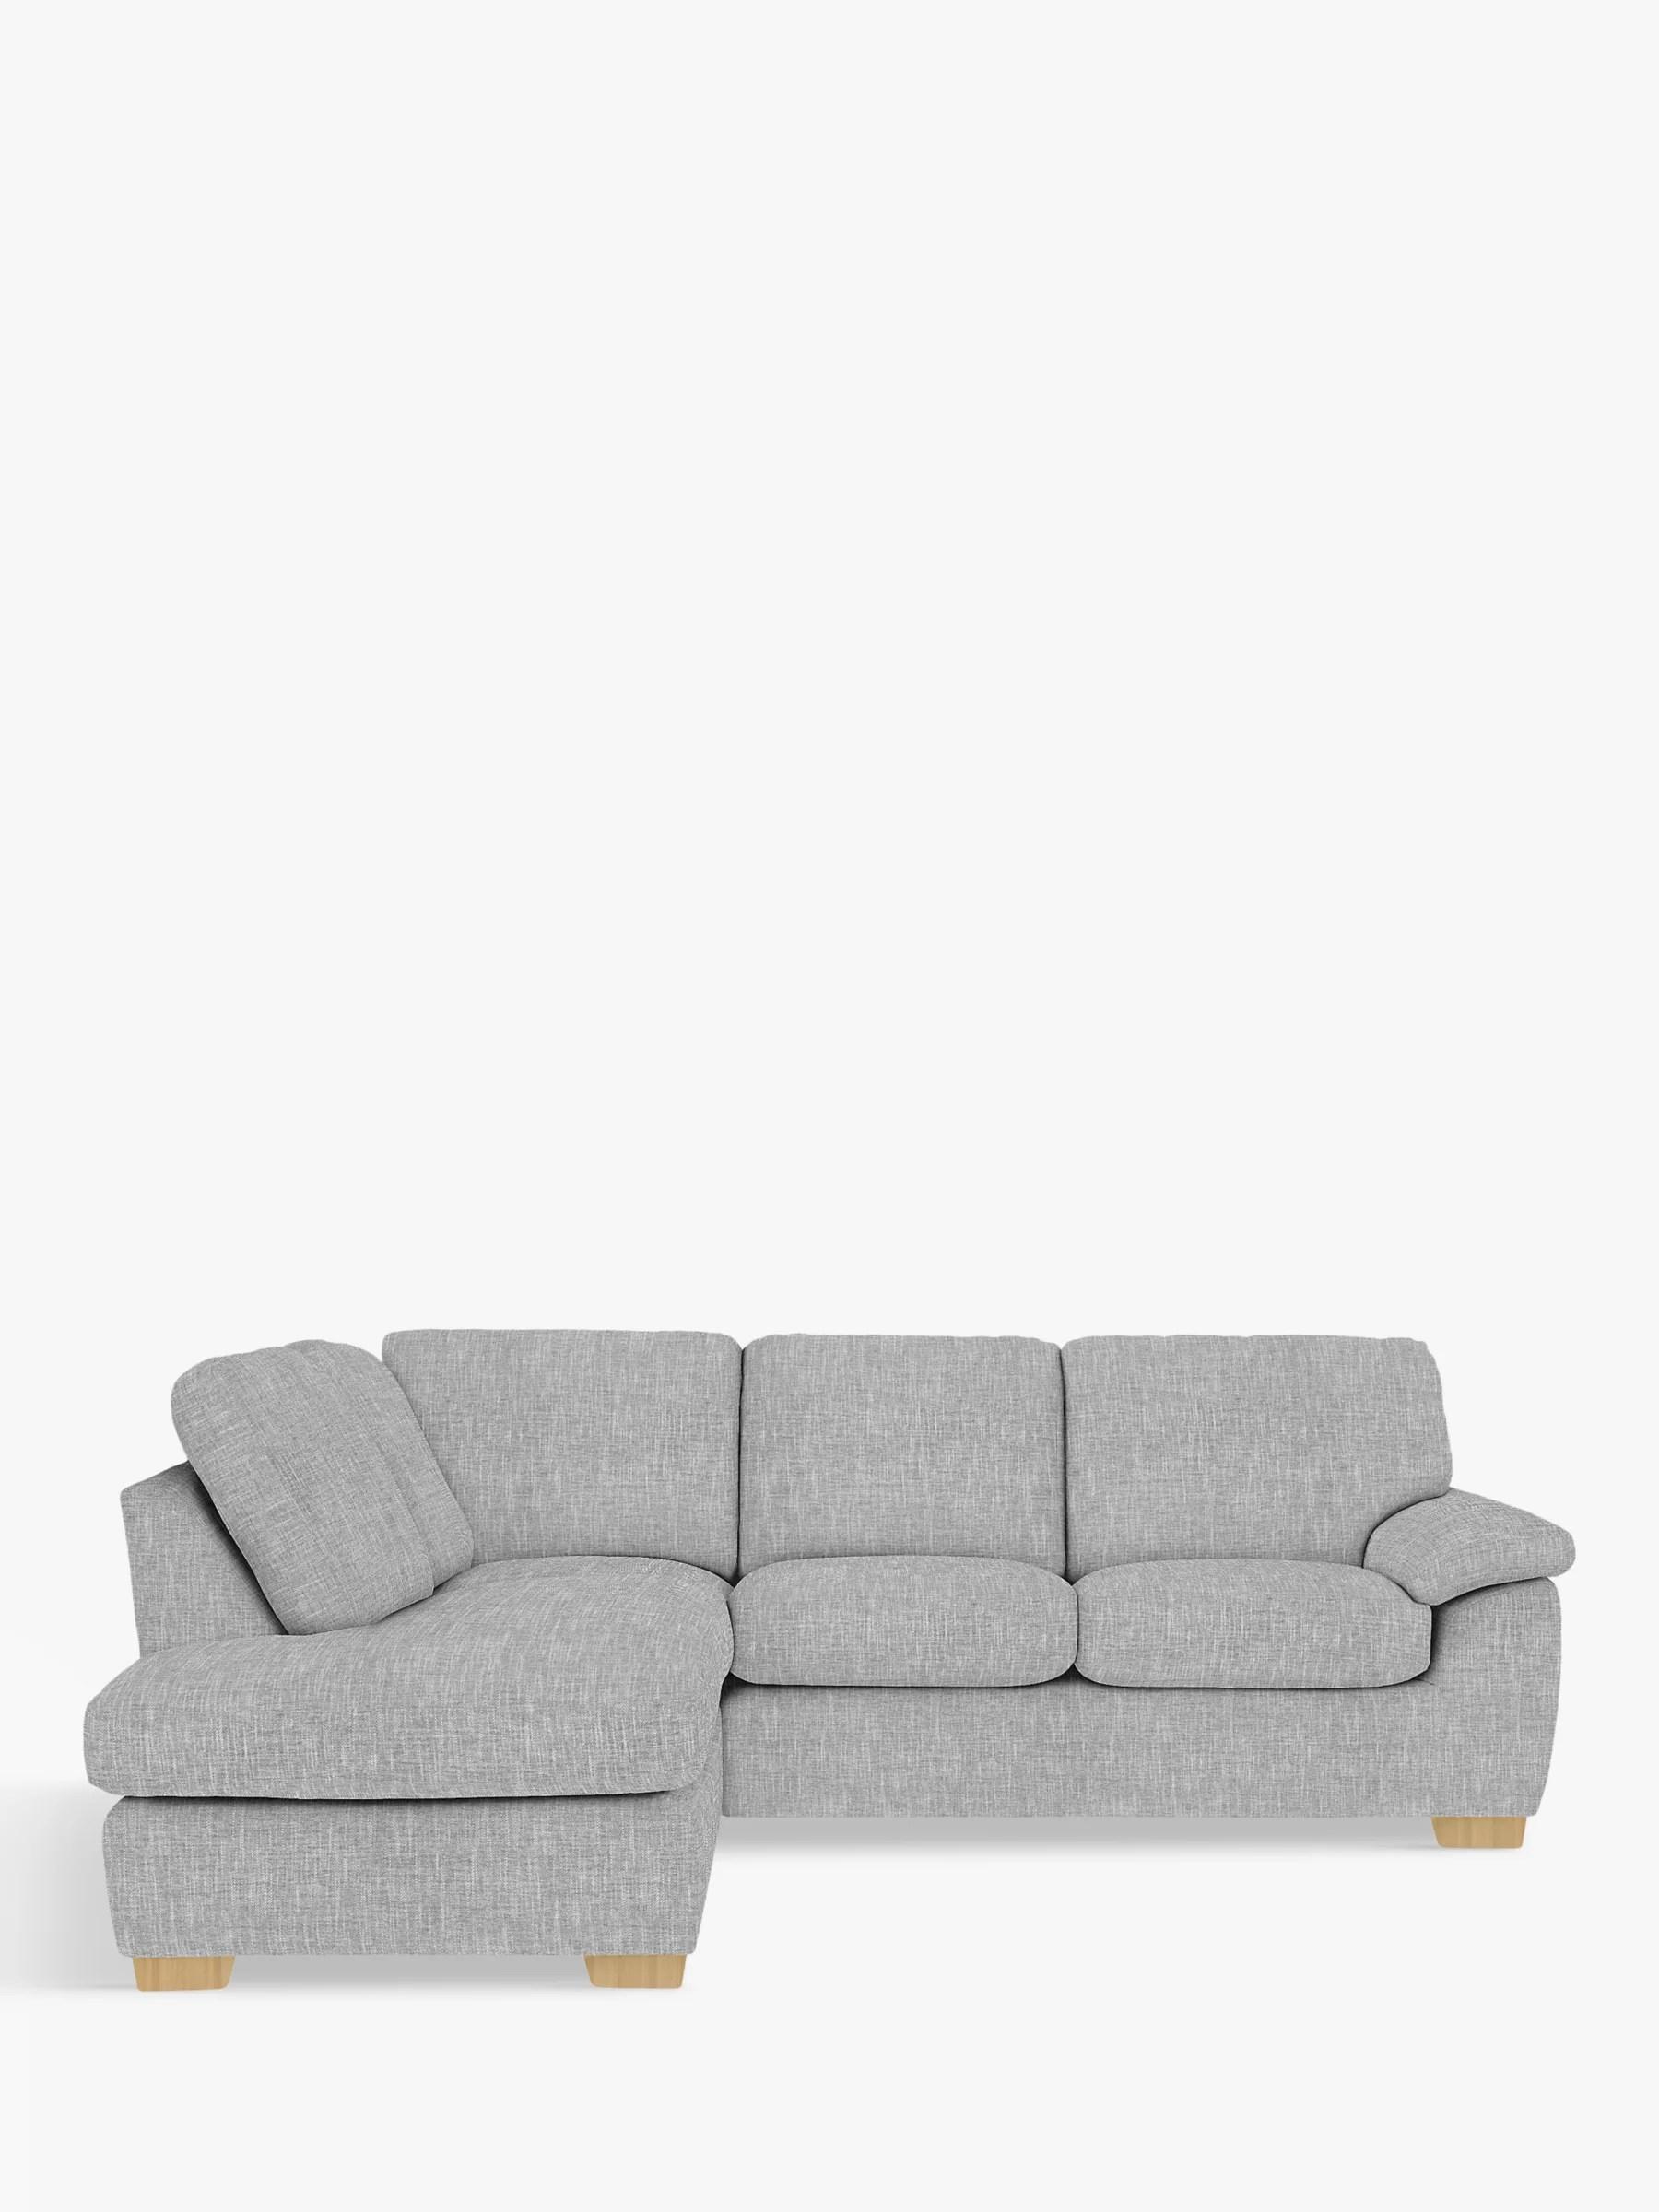 camden sofa john lewis julius 6 piece leather power motion sectional lhf corner end chaise unit light leg at